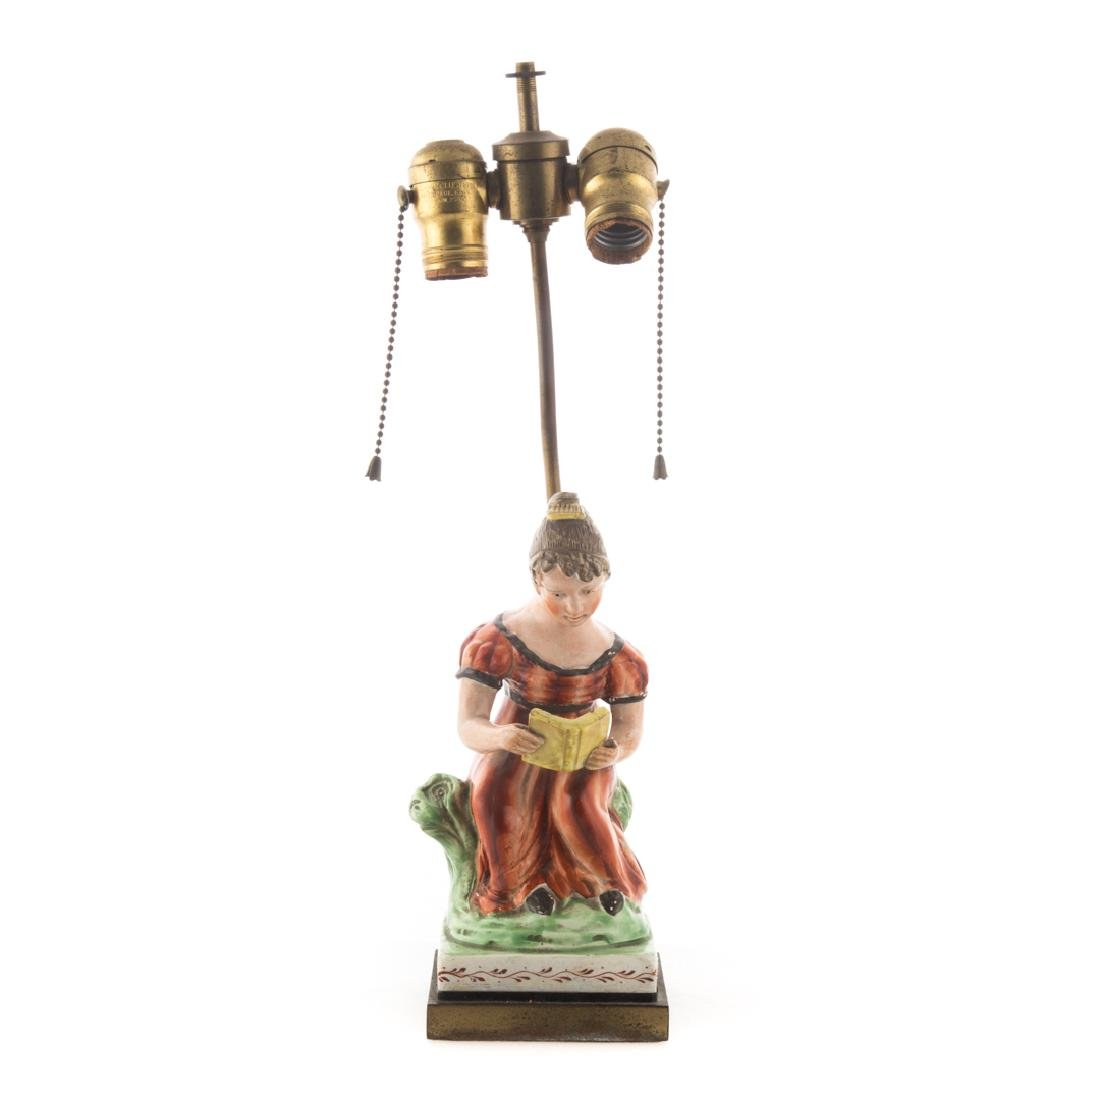 Staffordshire pearlware figural lamp